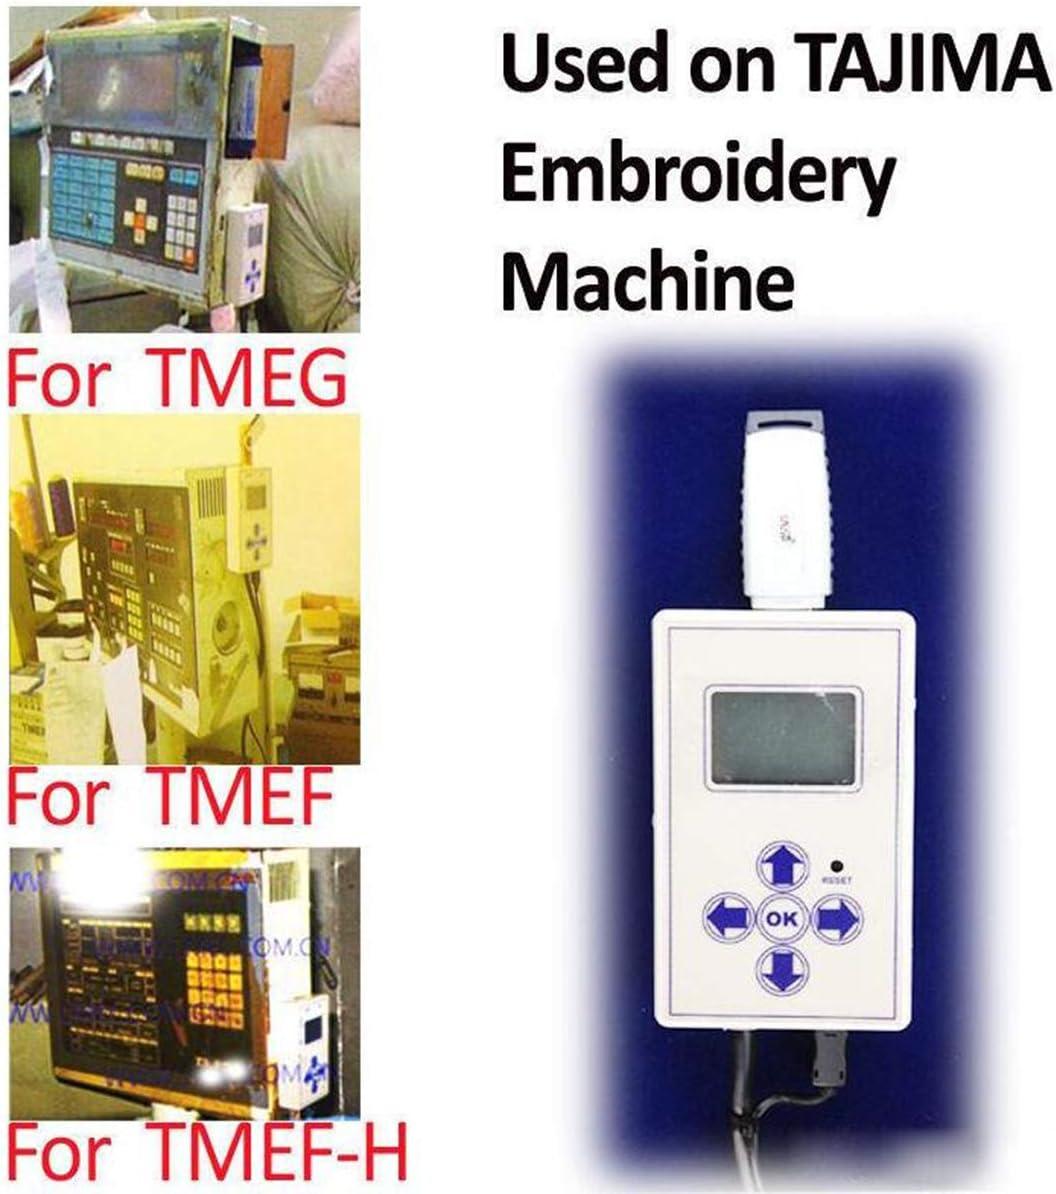 TMEF TMEX CKPSMS brand TME-DC 1SET #KP-BS-T-113 USB READER fit for Tajima embroidery machine TMFX TMEG TMEF-H